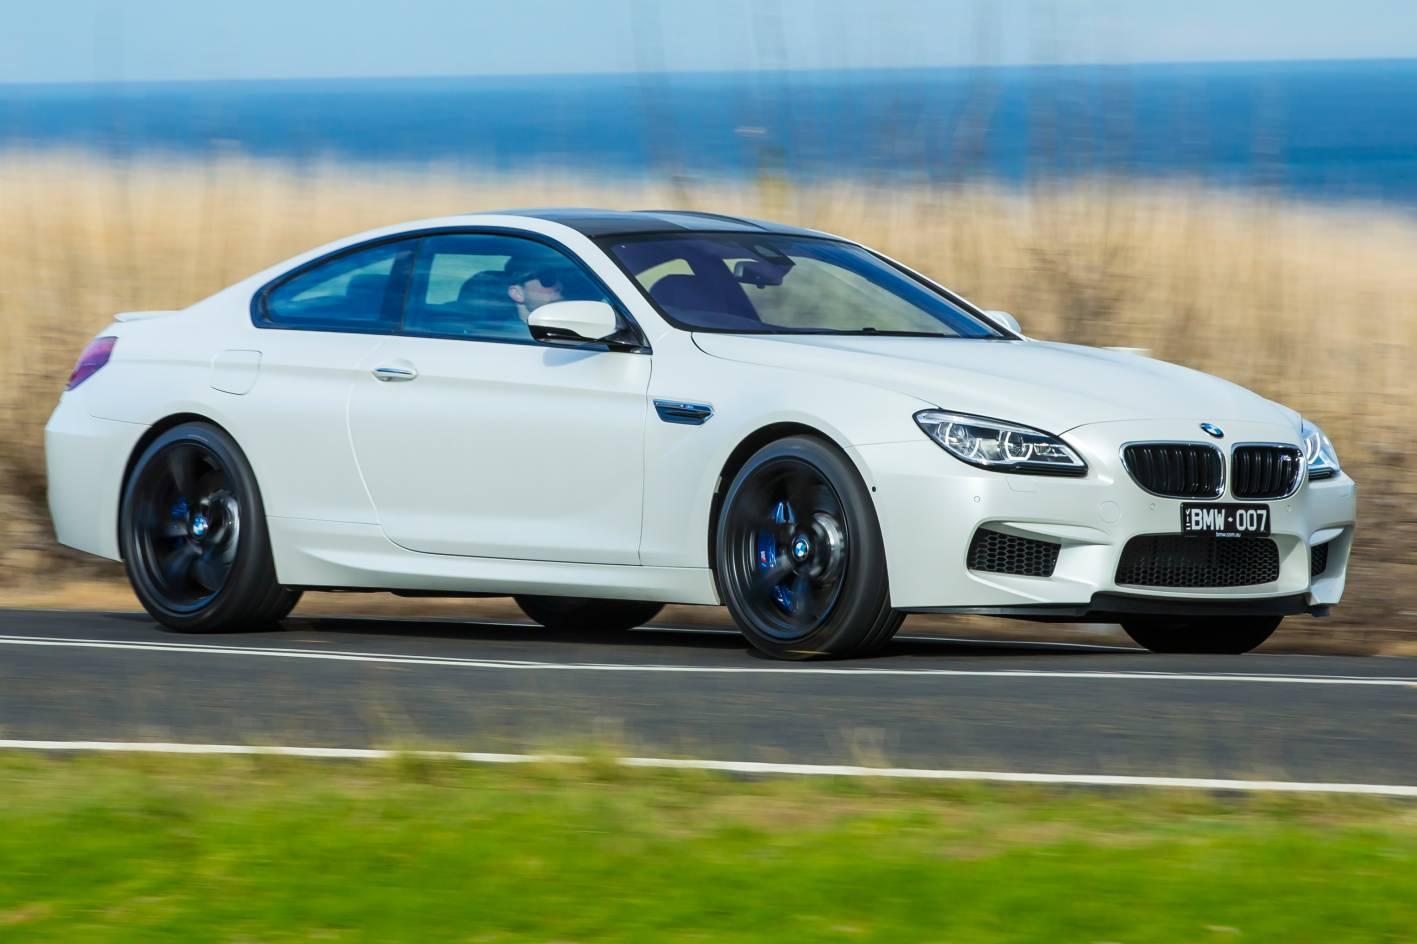 Bmw Cars News Bmw Australia Passes On Lct Savings In Full